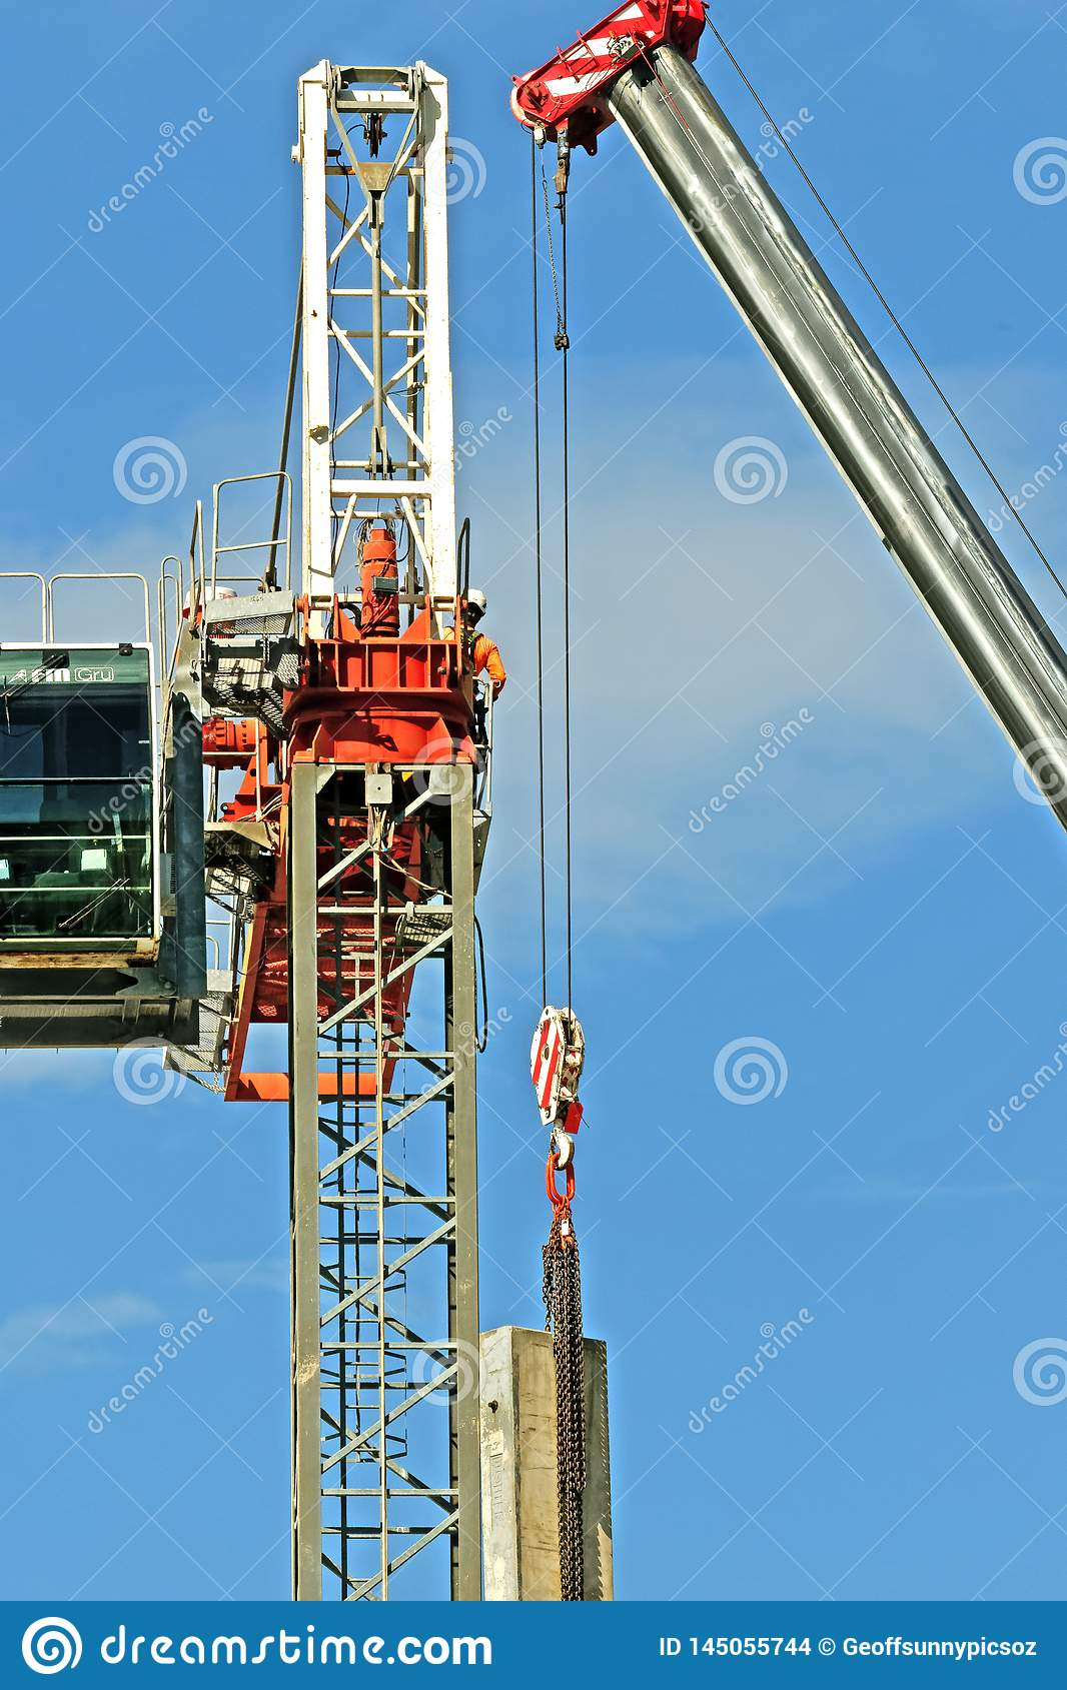 Construction crane removal. Update ed310. Gosford. April 9, 2019